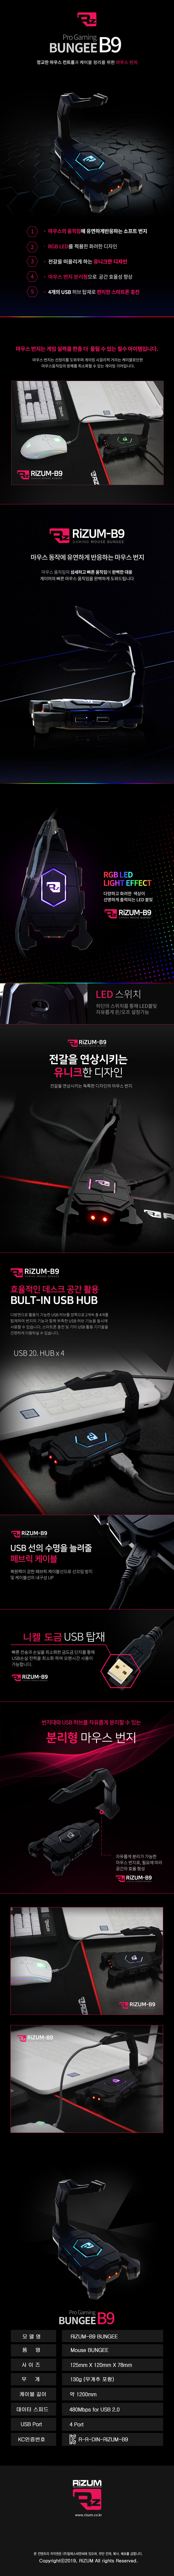 RIZUM  B9 마우스 번지